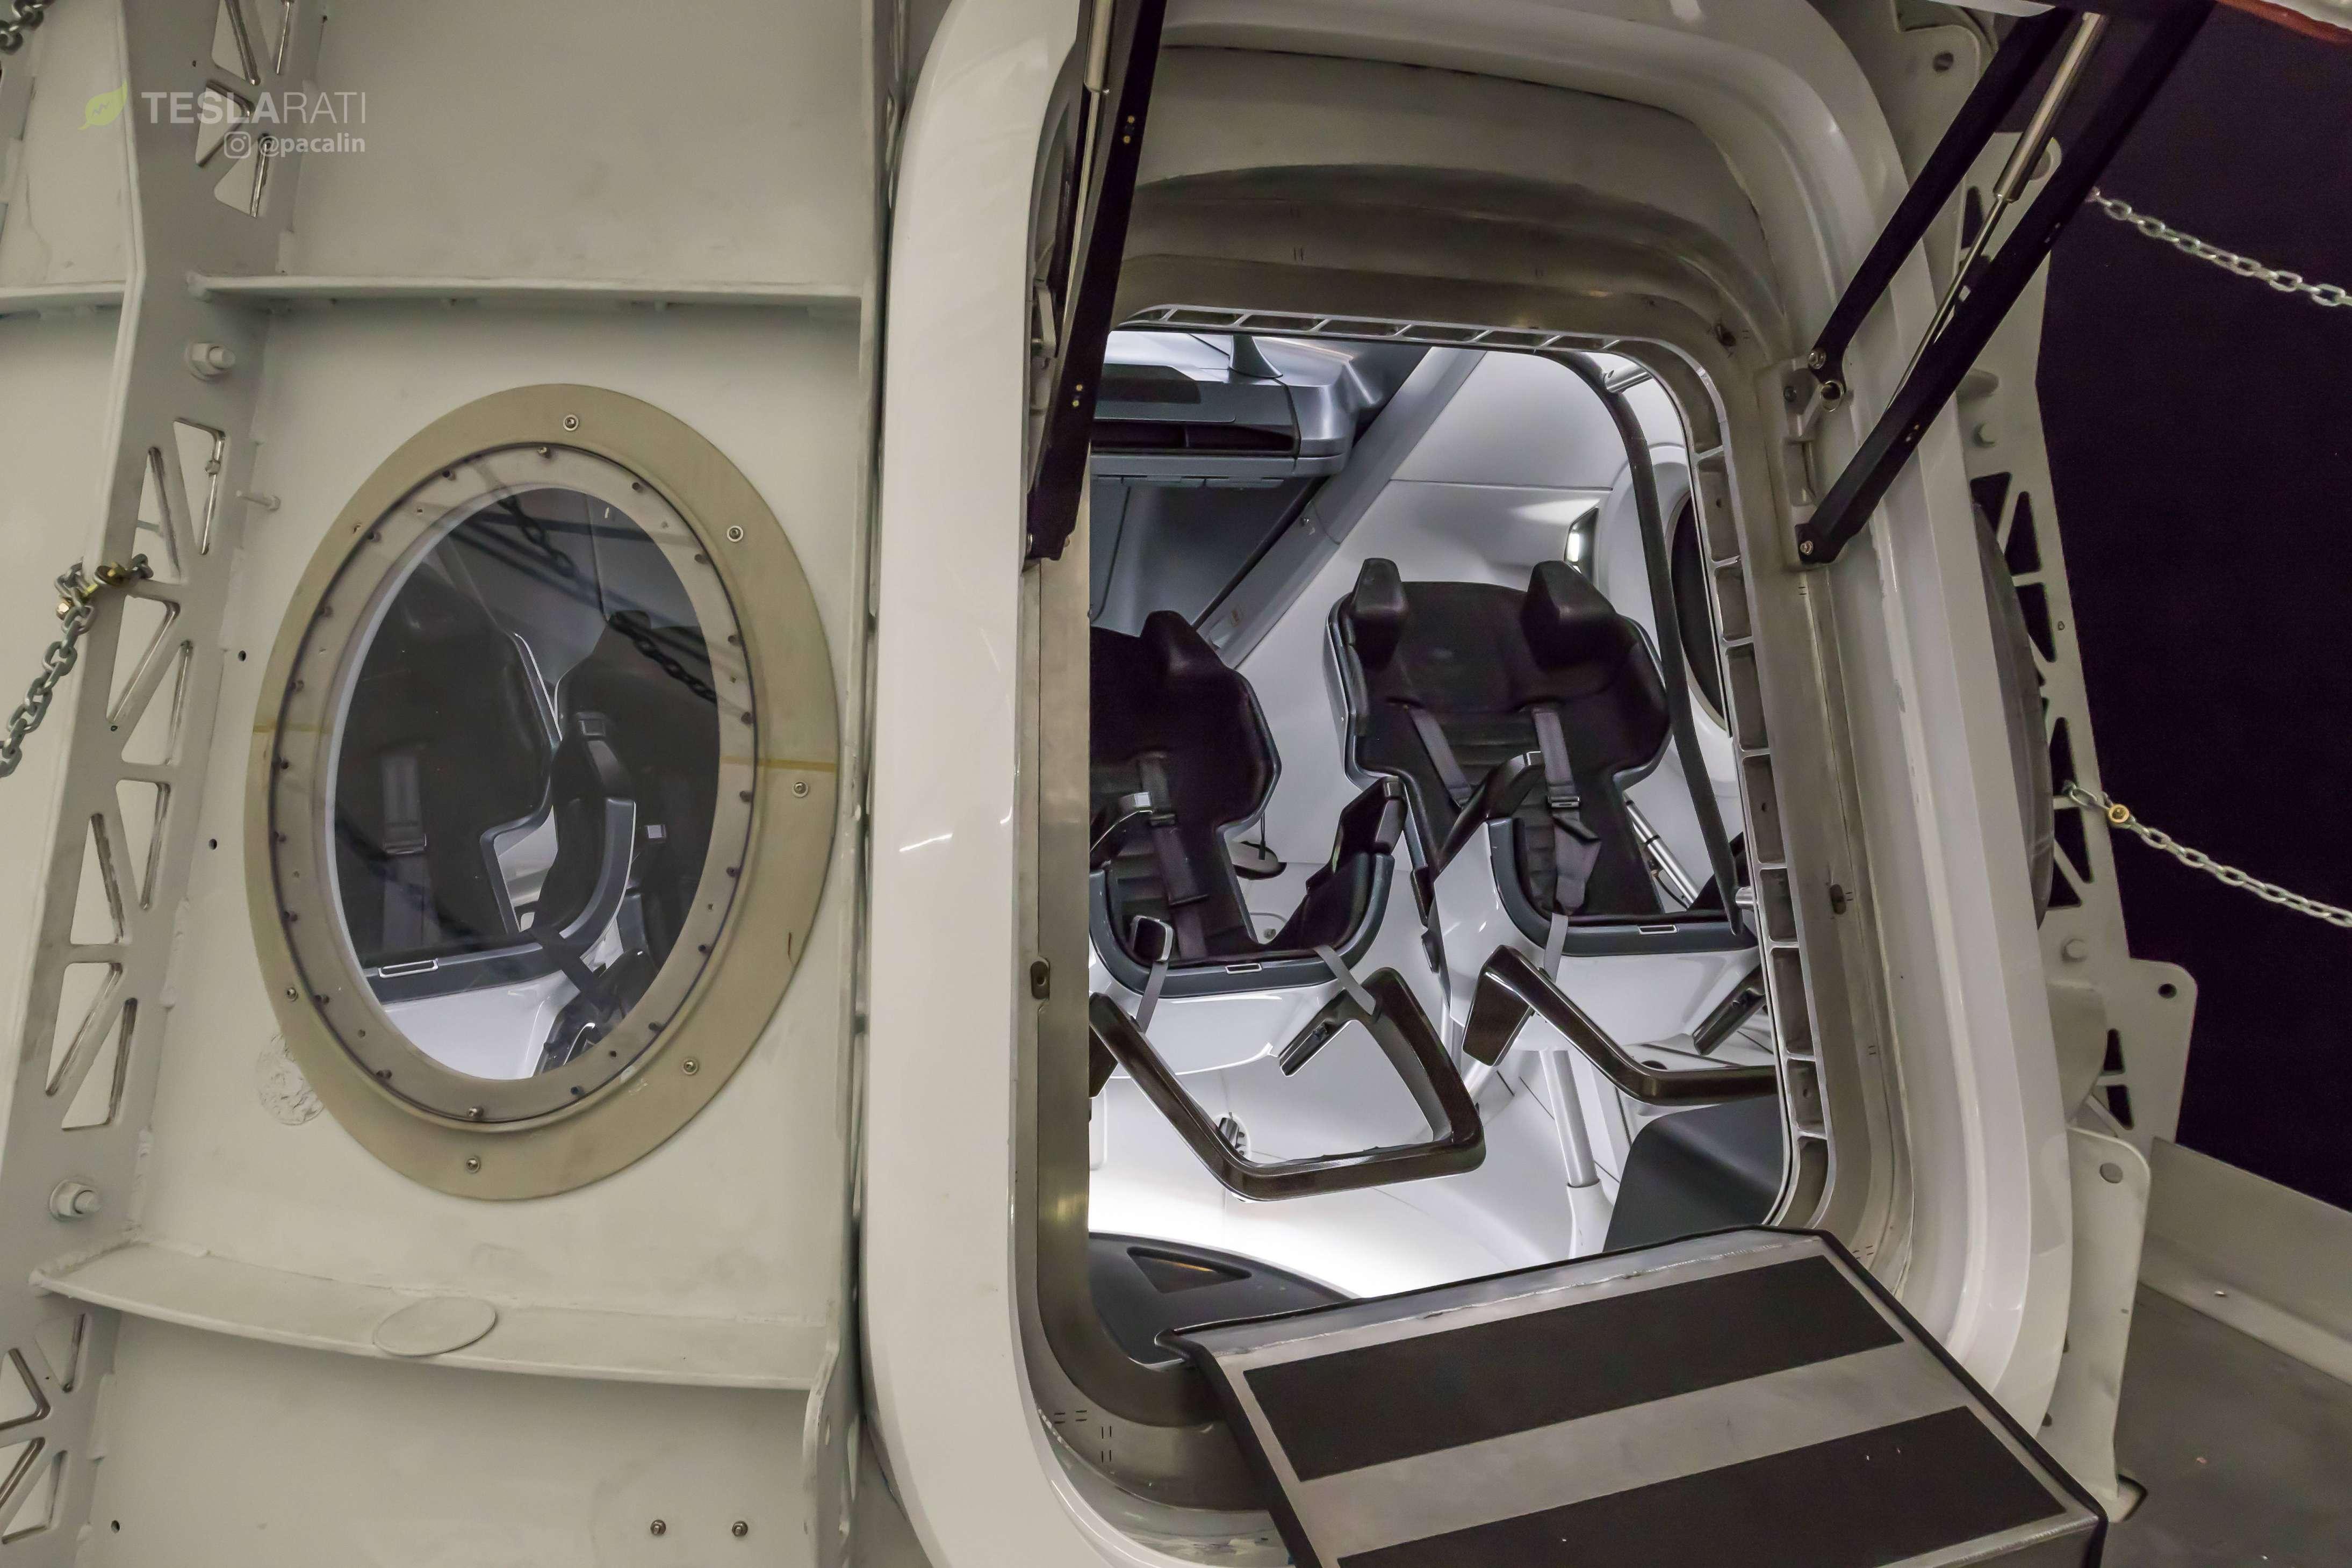 Crew Dragon simulator cabin 081318 (SpaceX) 10 (c)